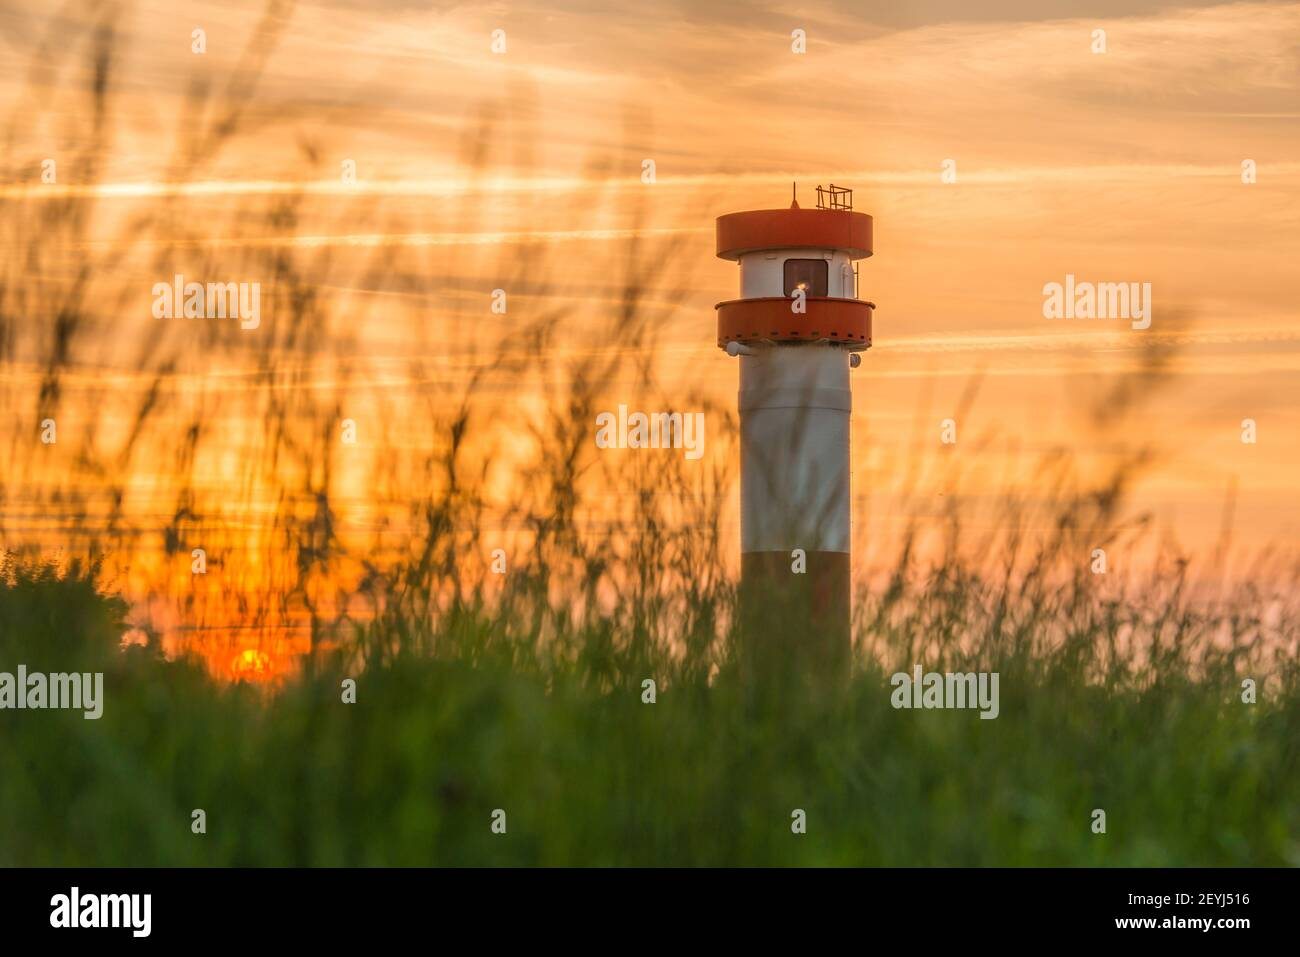 Germany, Lower Saxony, Krautsand: Evening mood. The red-white lighthouse and sunset on the Krautsand Elbinsel. Stock Photo